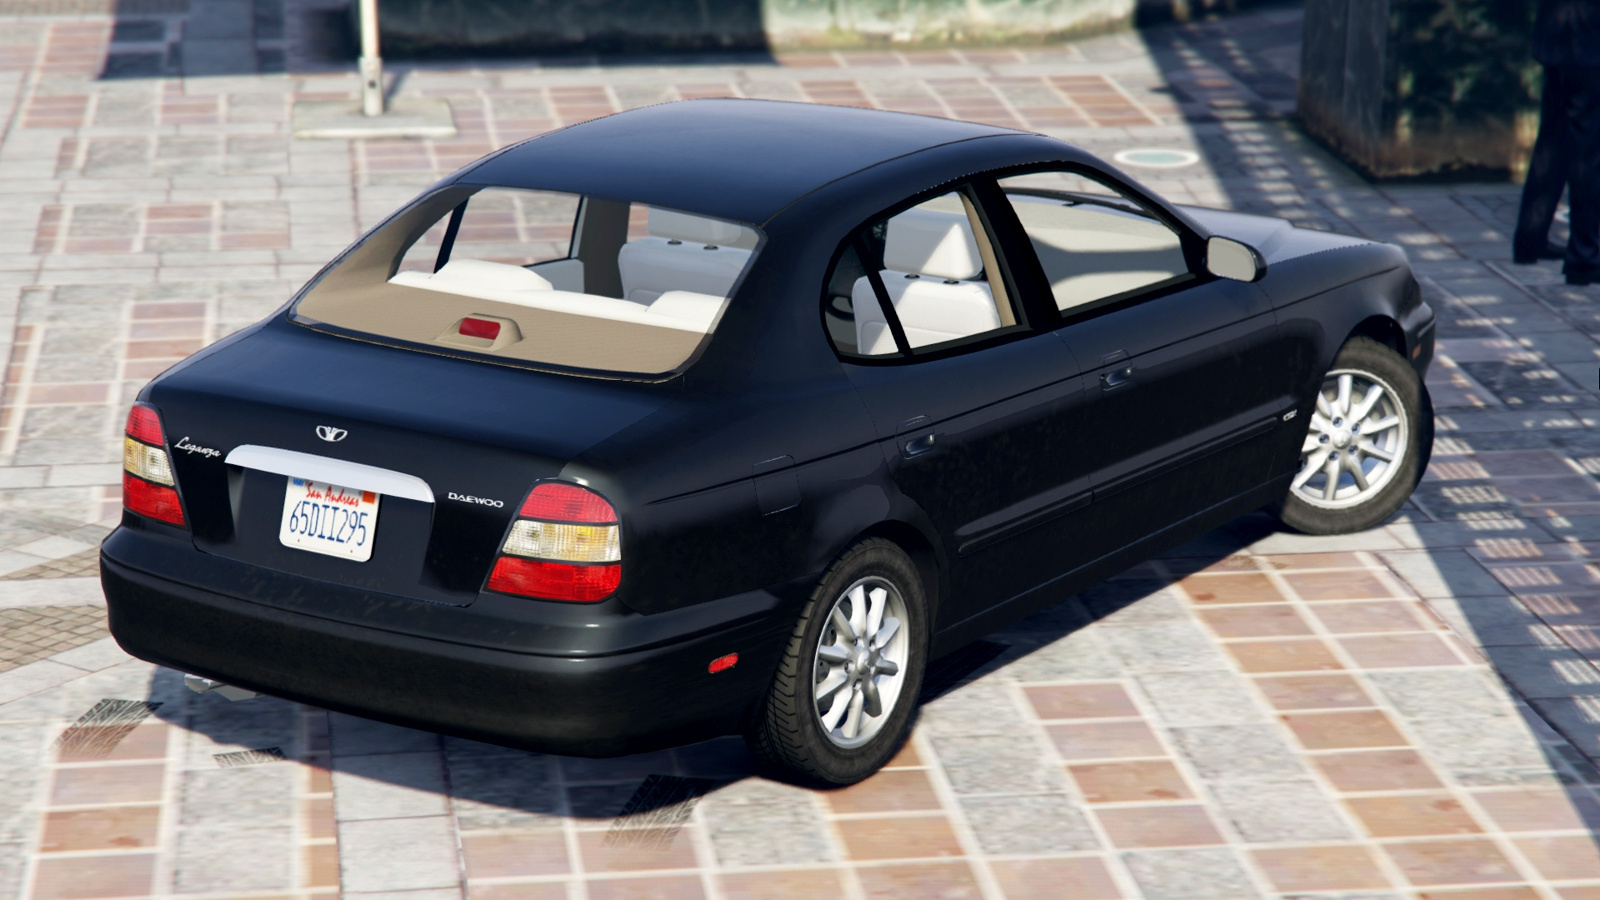 2001 Daewoo Leganza US [Add-On / Rep | Tuning] - GTA5-Mods.com